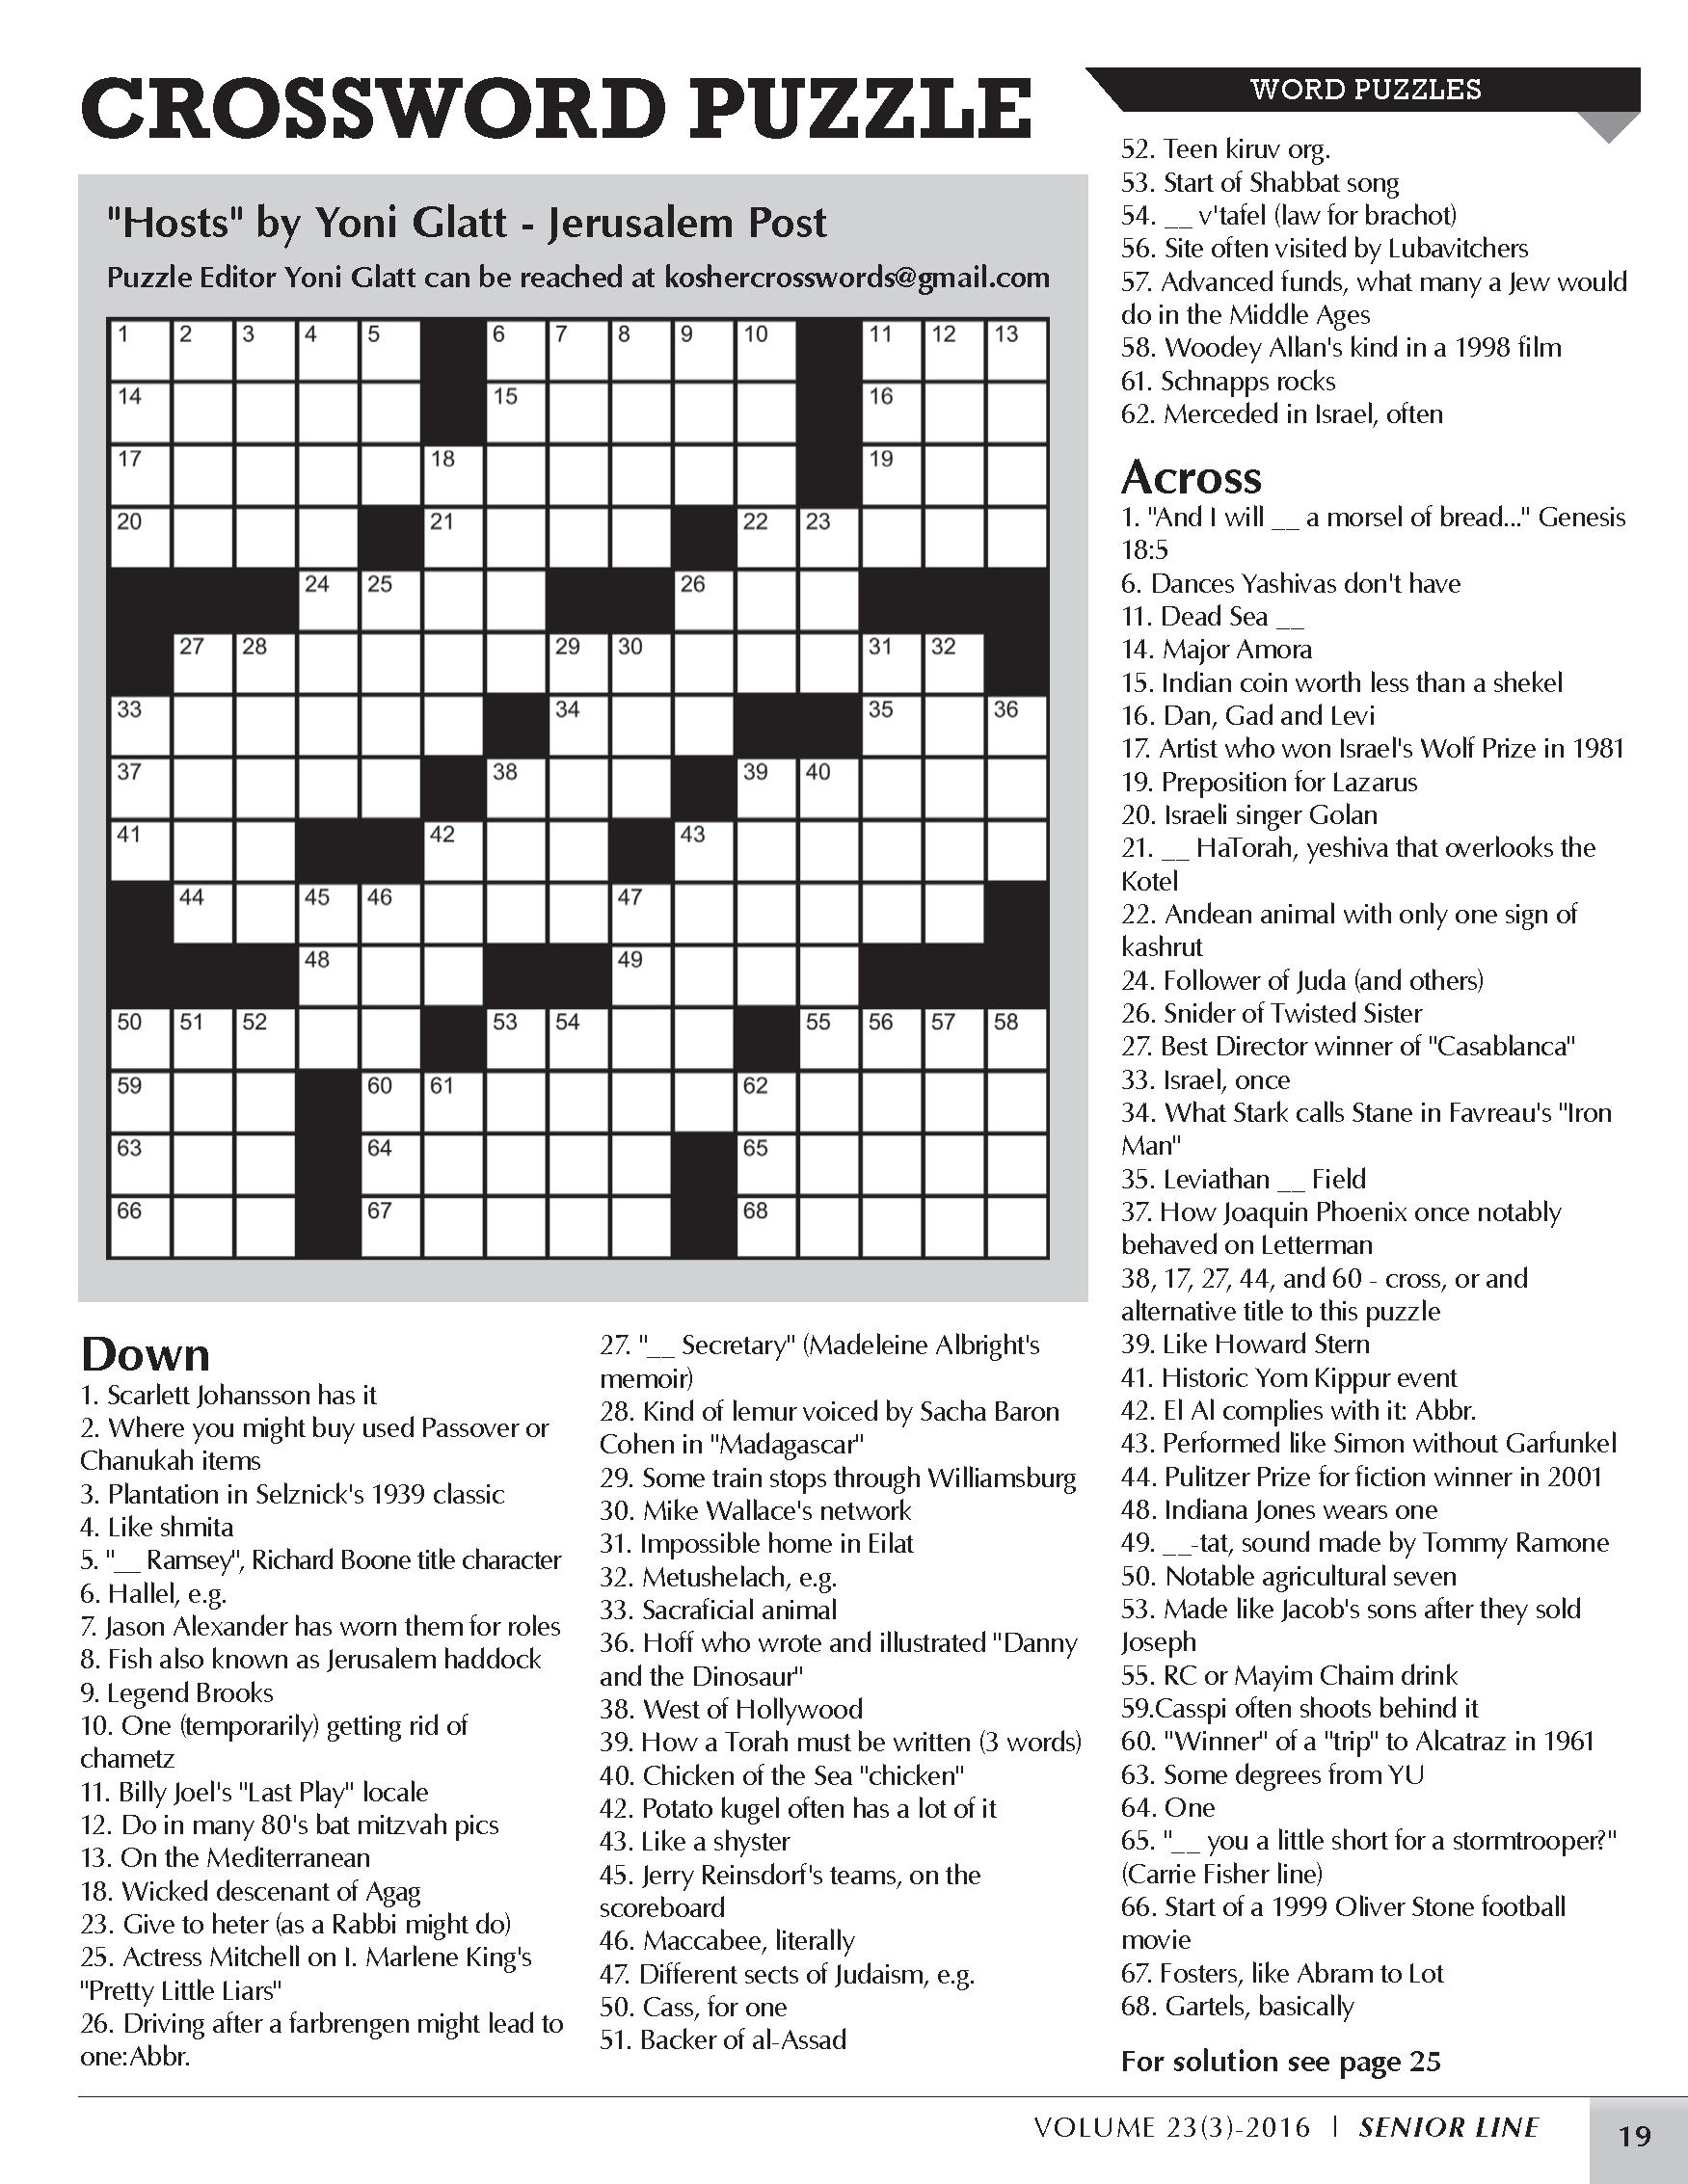 Crossword Puzzle To Test Your Vocabulary Skills - Jewish Seniors - Printable Crossword Puzzle Pdf